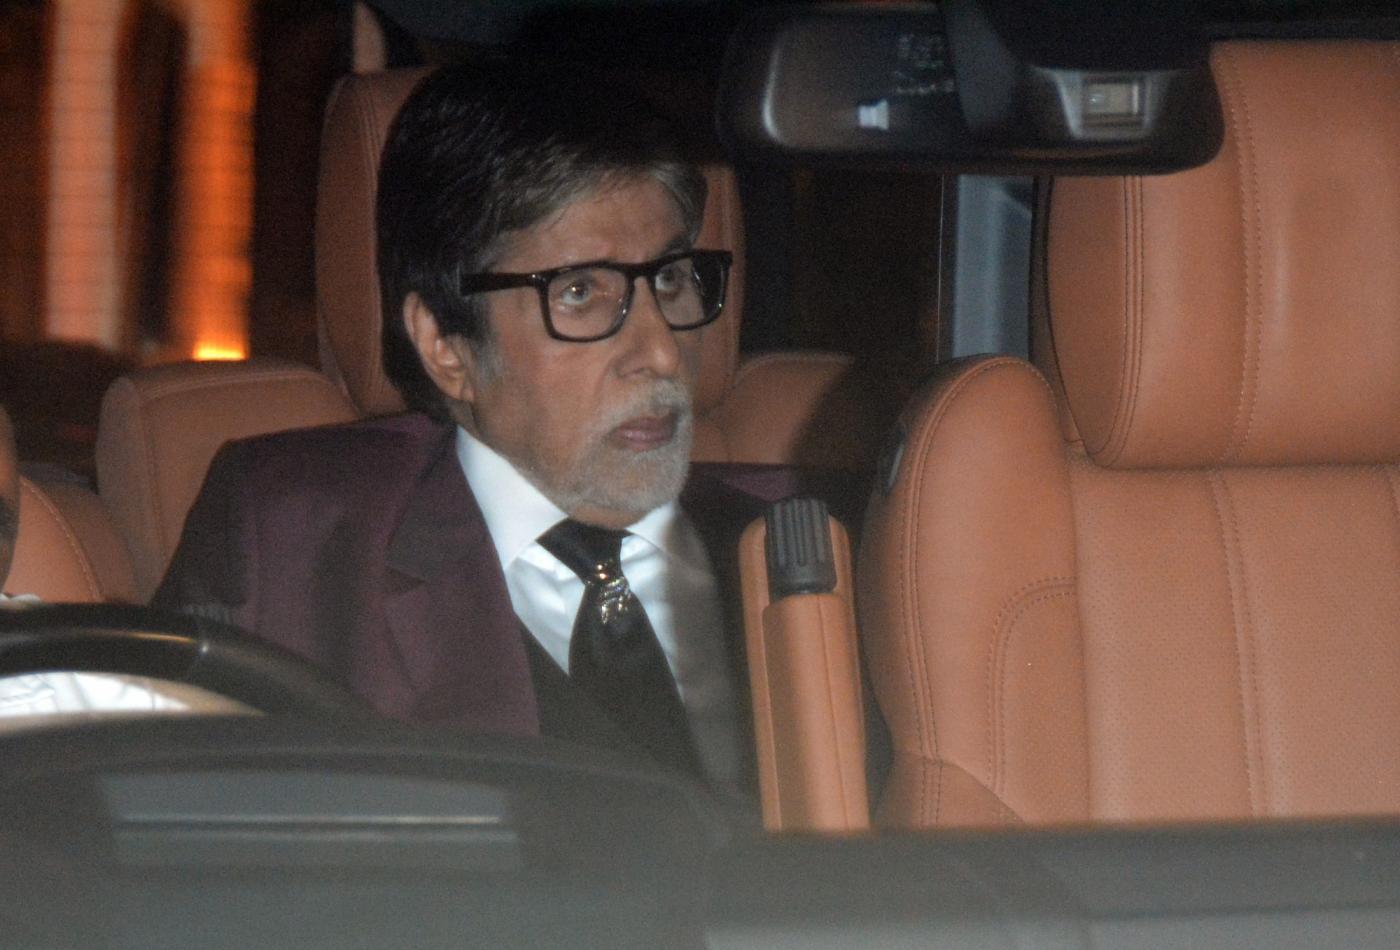 Mumbai: Actor Amitabh Bachchan at her granddaughter Aaradhya Bachchan's birthday party in Mumbai, on Nov 17, 2018. (Photo: IANS) by .